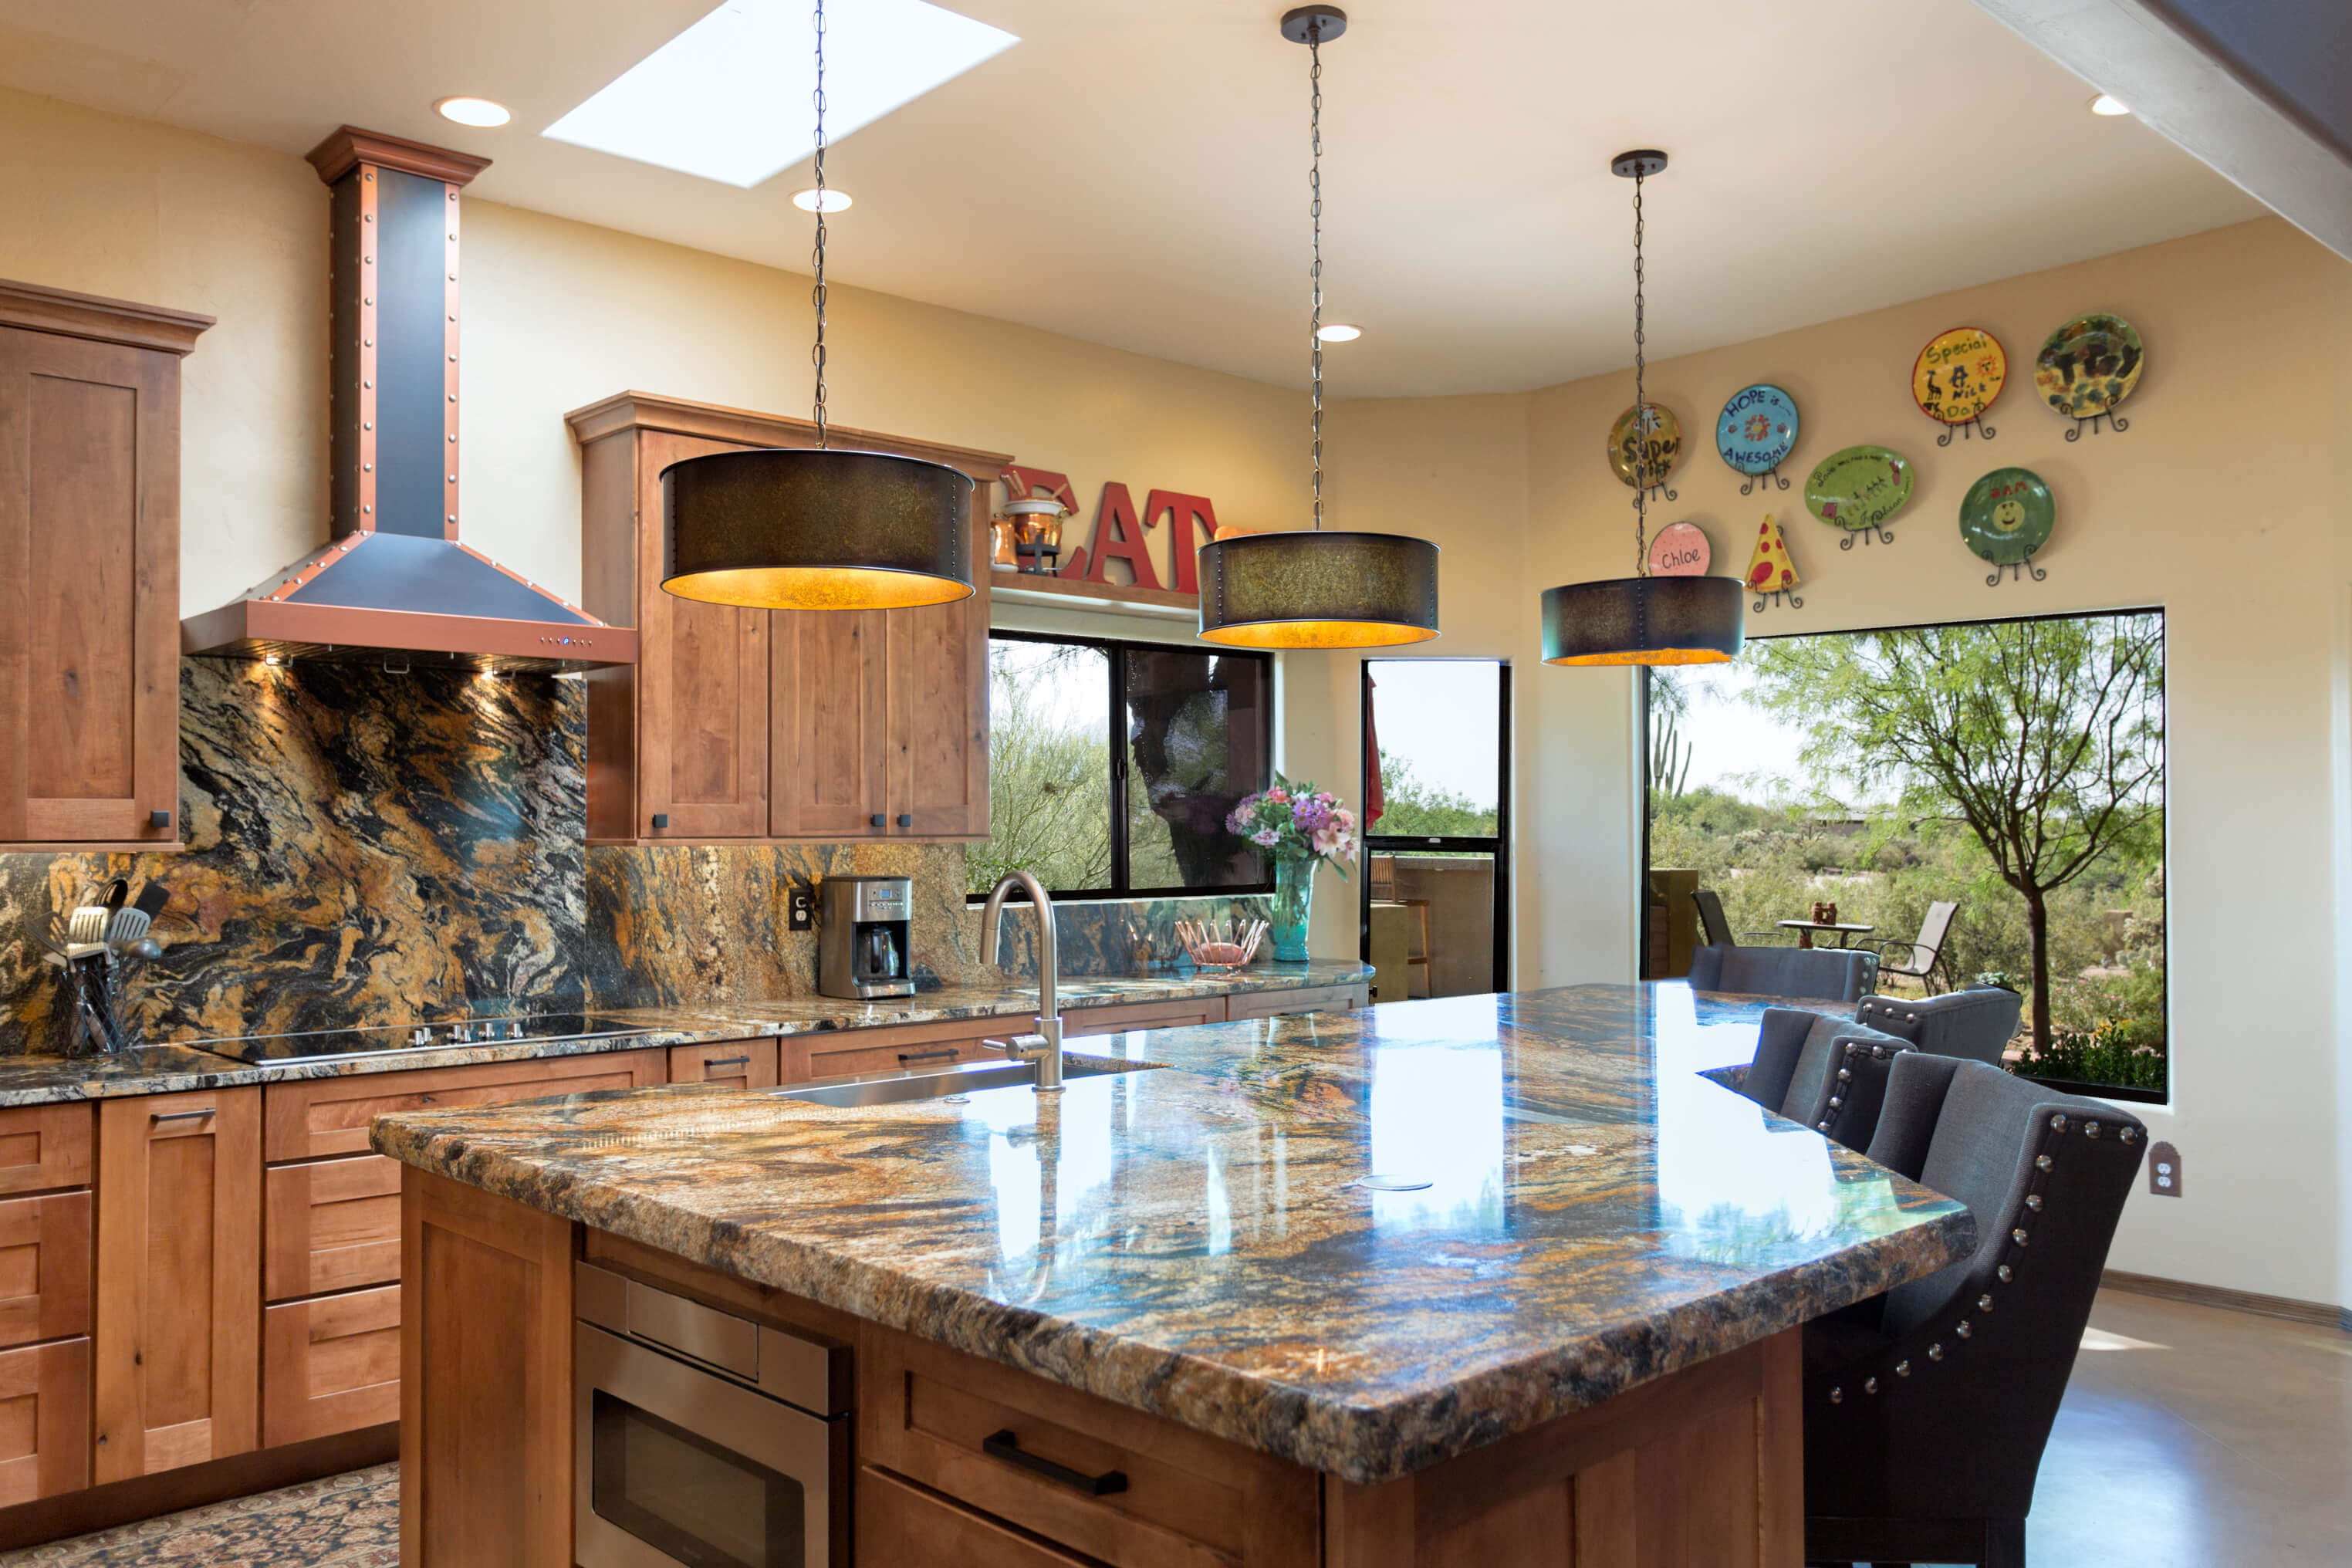 Moore road kitchen remodel designer laura wallace for Southwest kitchen designs